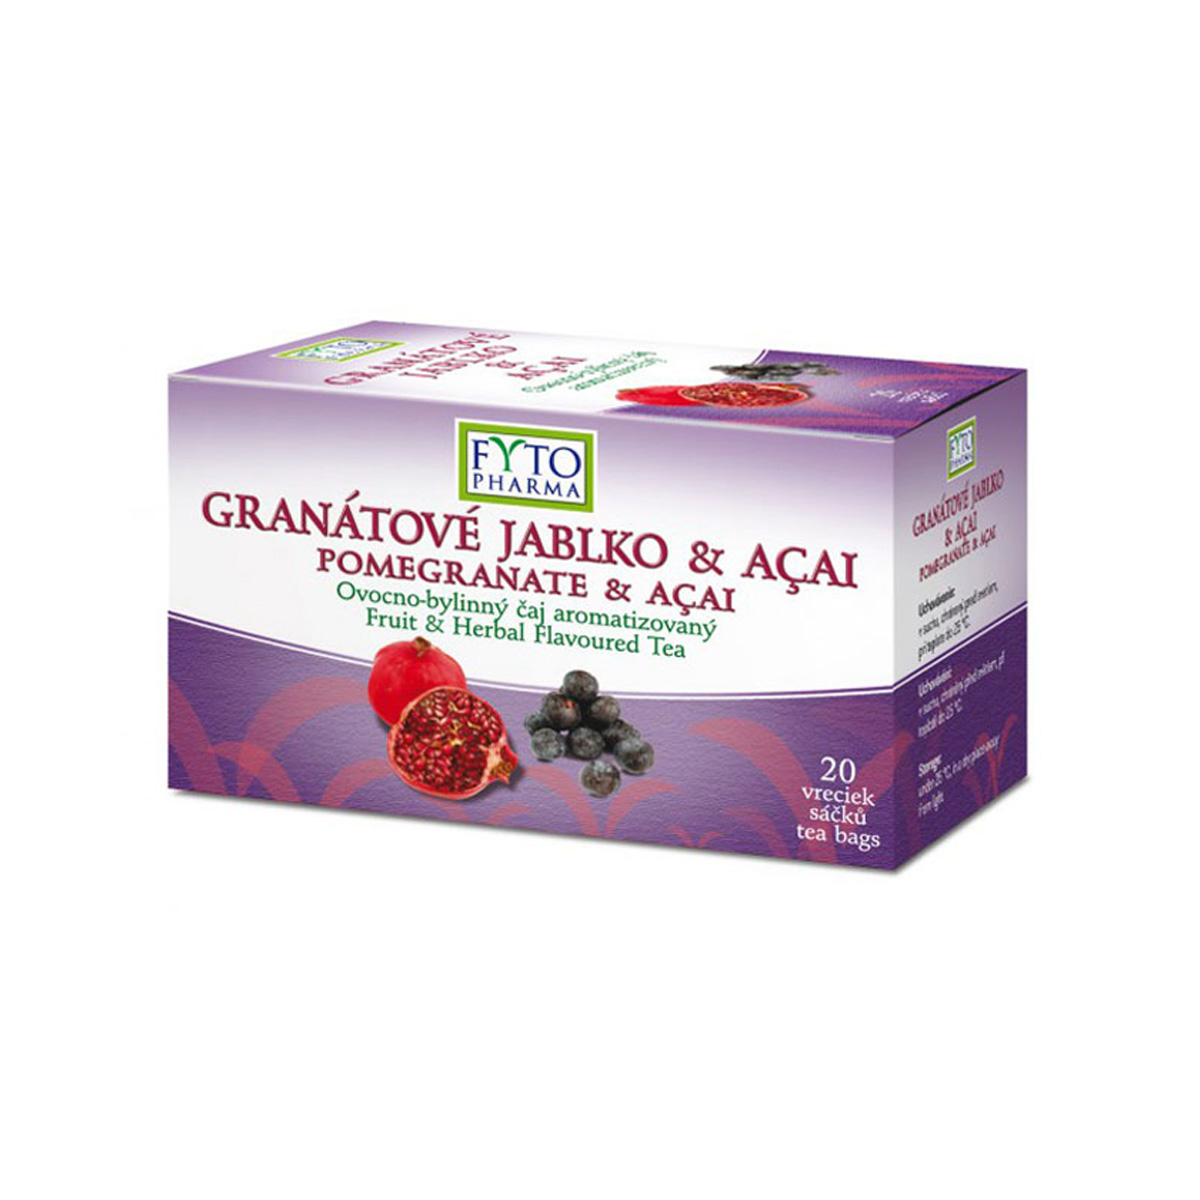 Fytopharma Ovocno-bylinný čaj granátové jablko & Acai 20 x 2 g